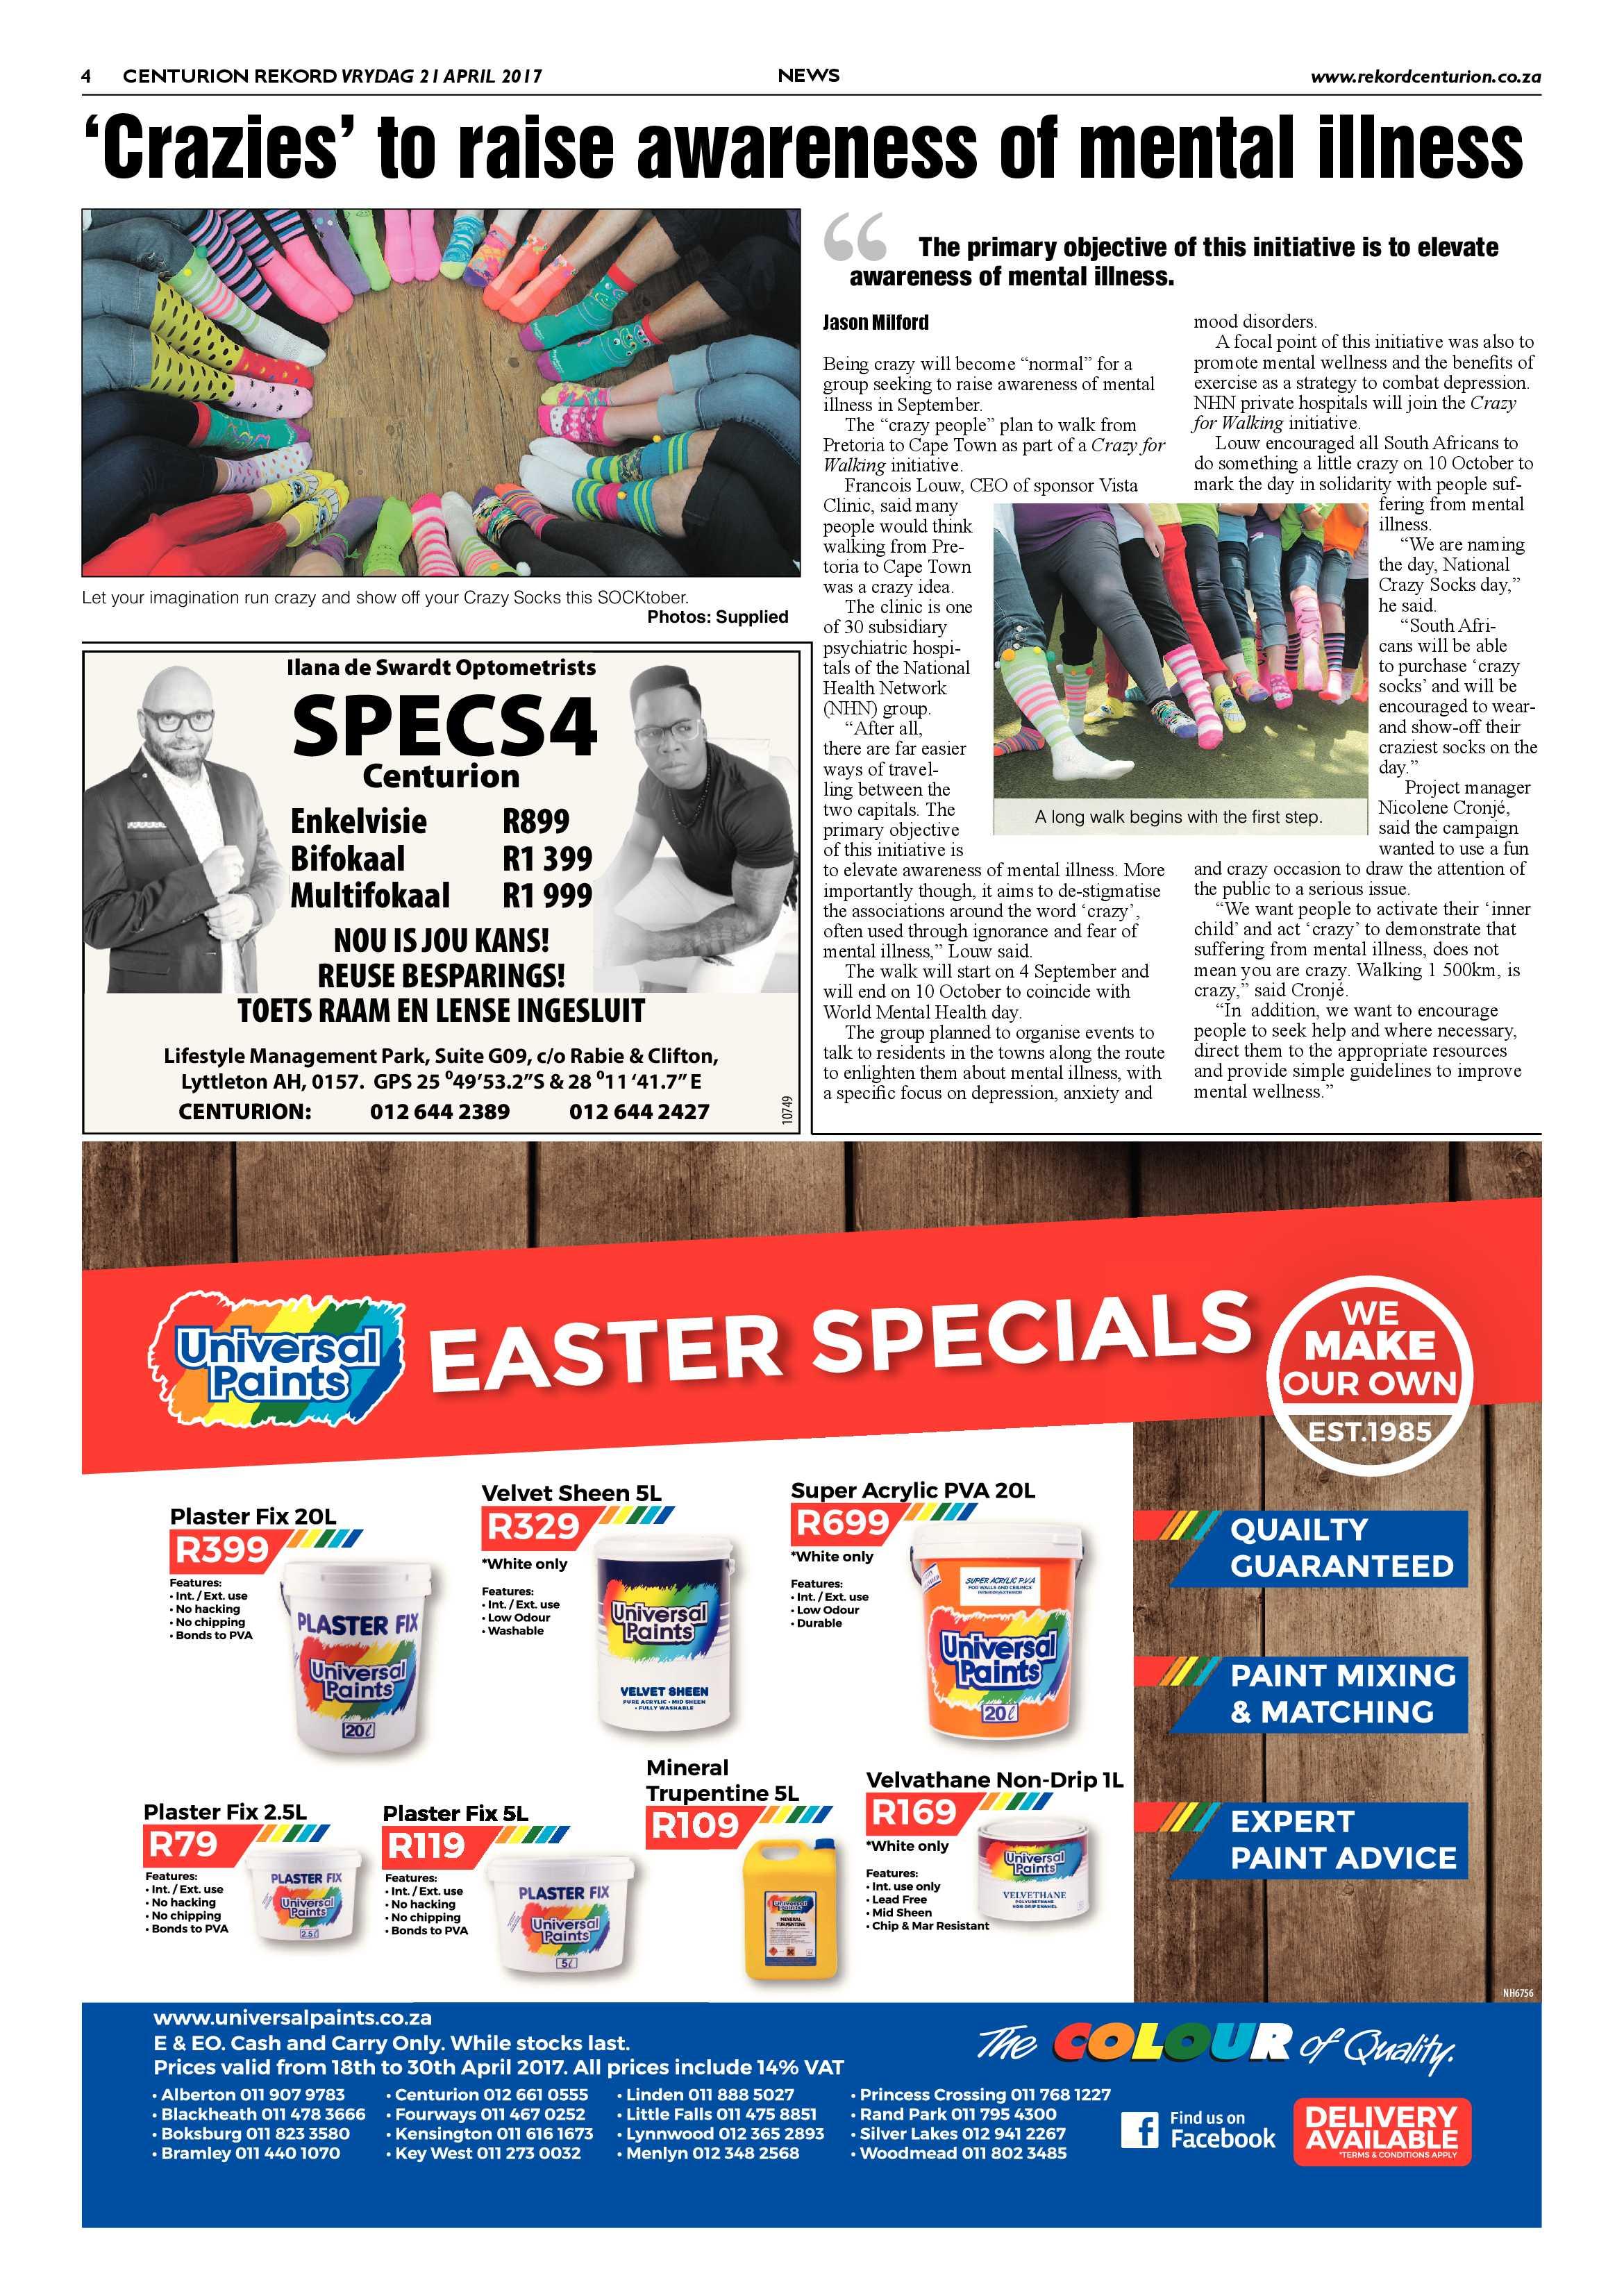 rekord-centurion-21-april-2017-epapers-page-4